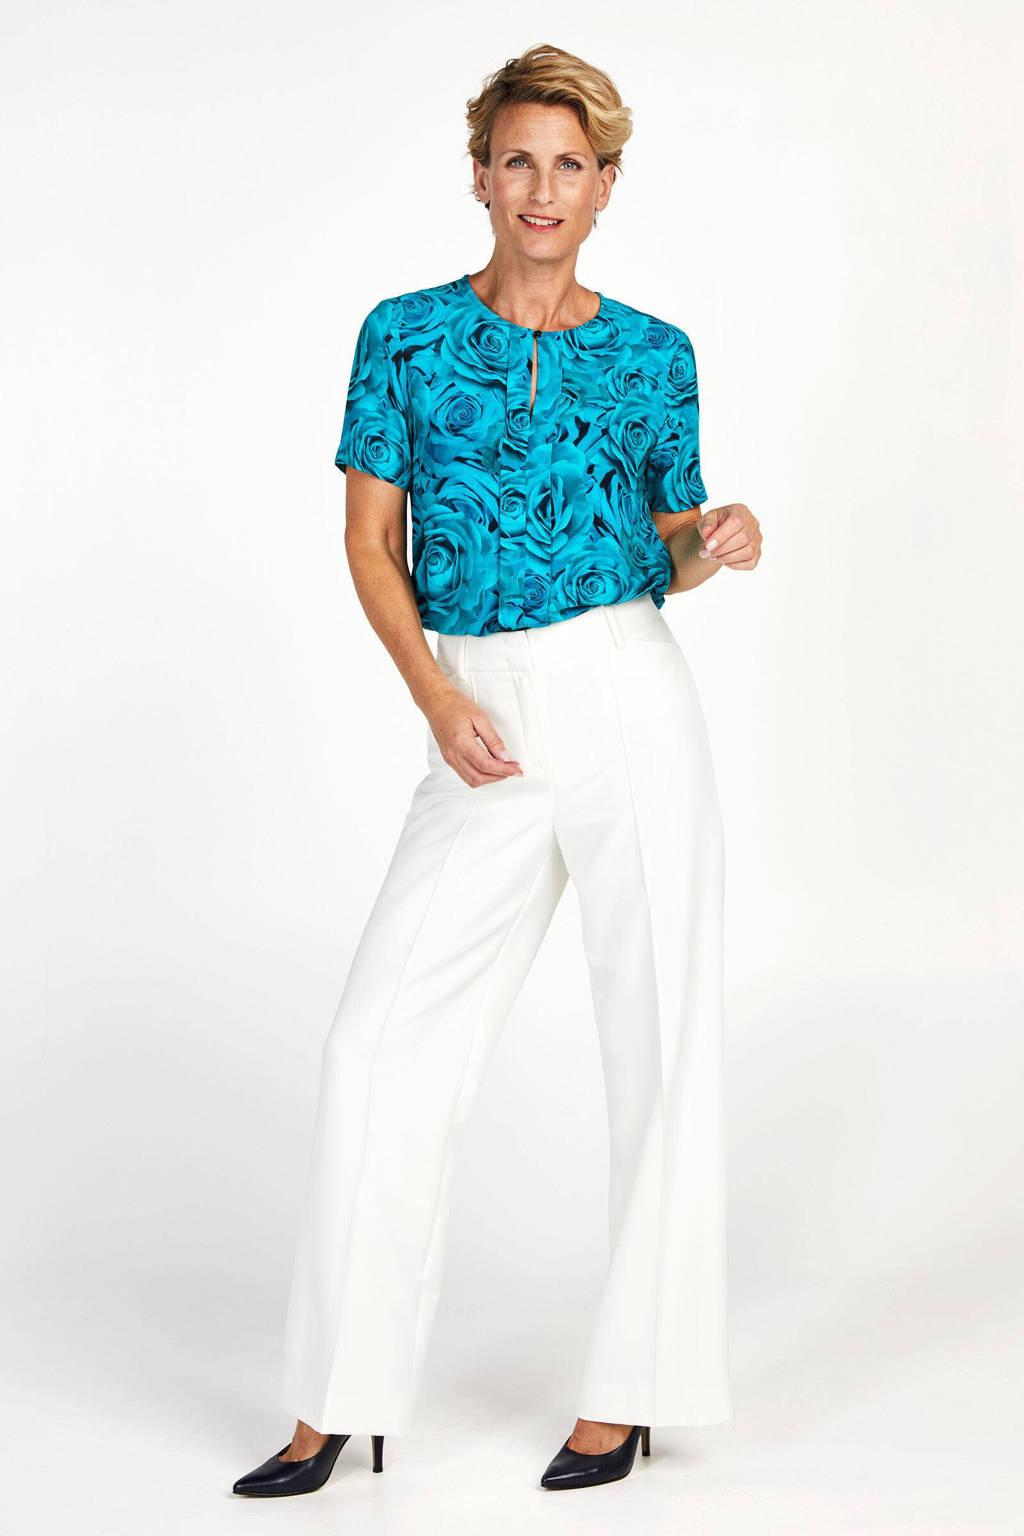 PROMISS gebloemd T-shirt blauw, Blauw